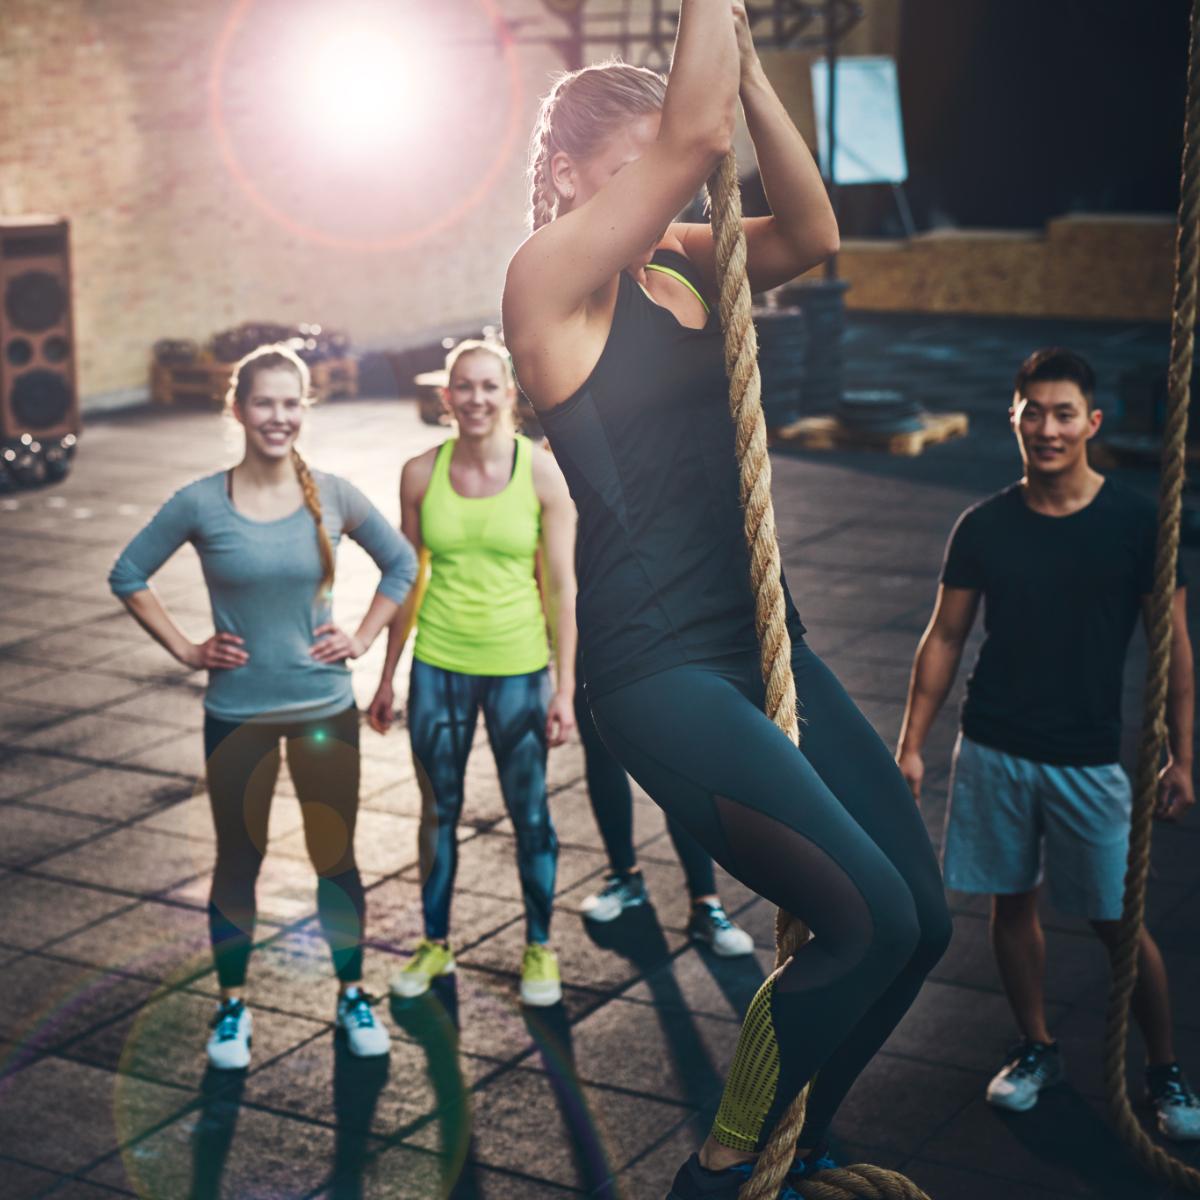 Urban Sports Club Bootcamp Workout